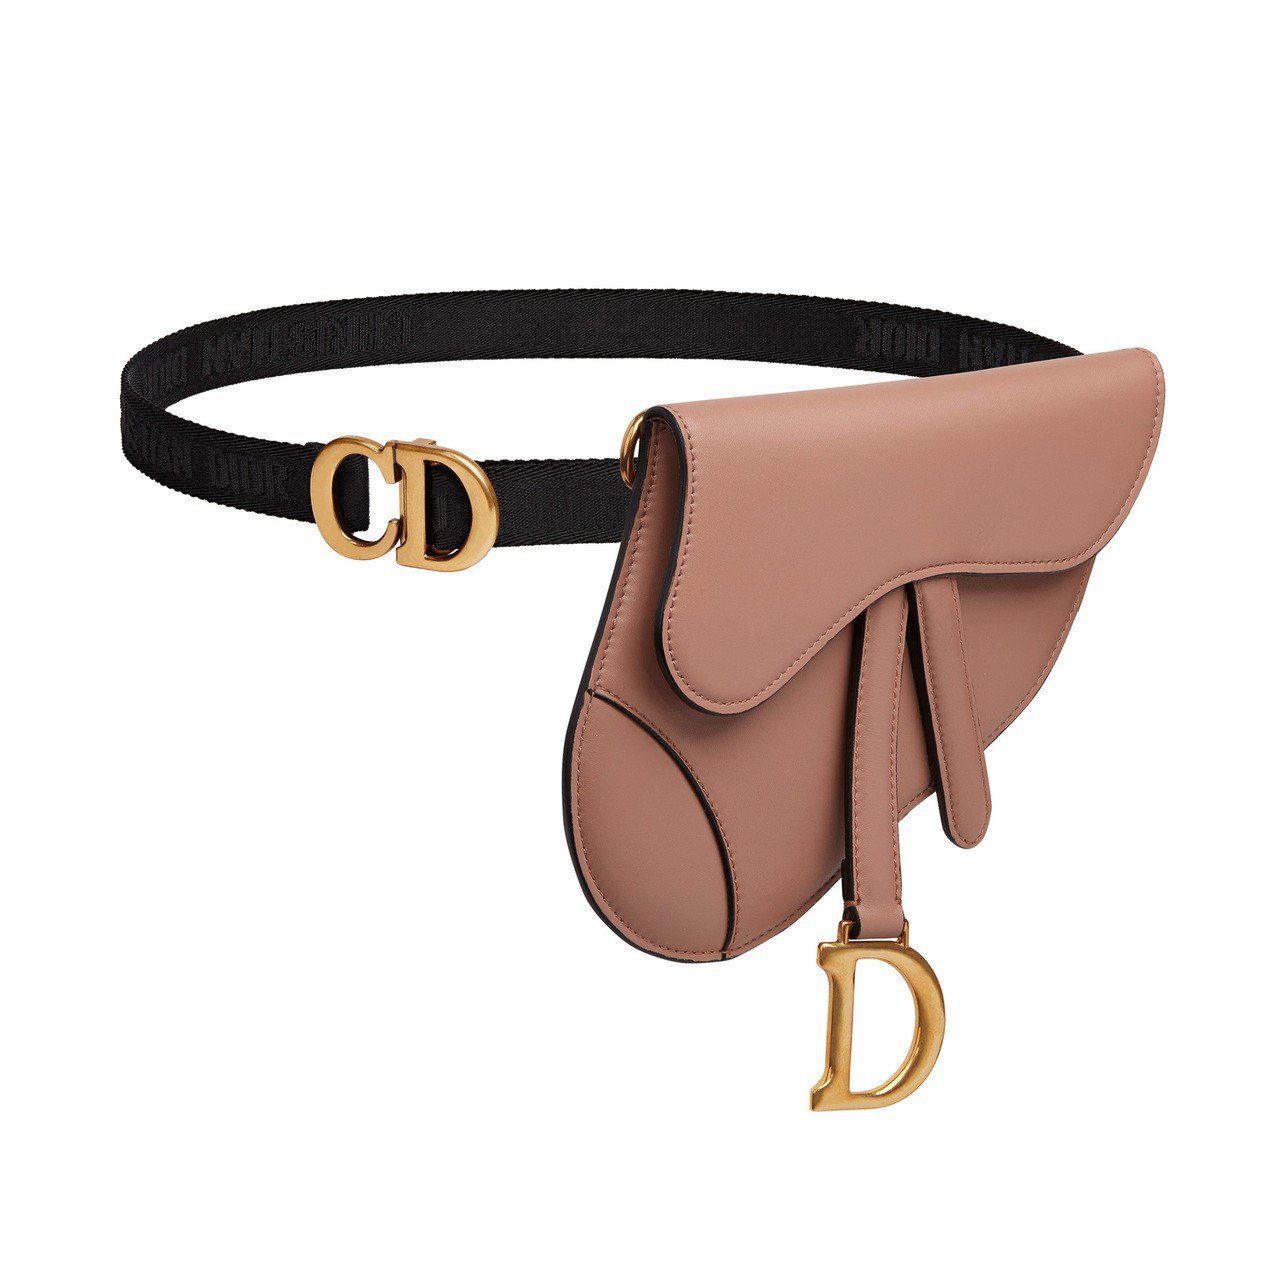 Dior Saddle胭脂粉小牛皮馬鞍腰包、56,000元。圖/Dior提供